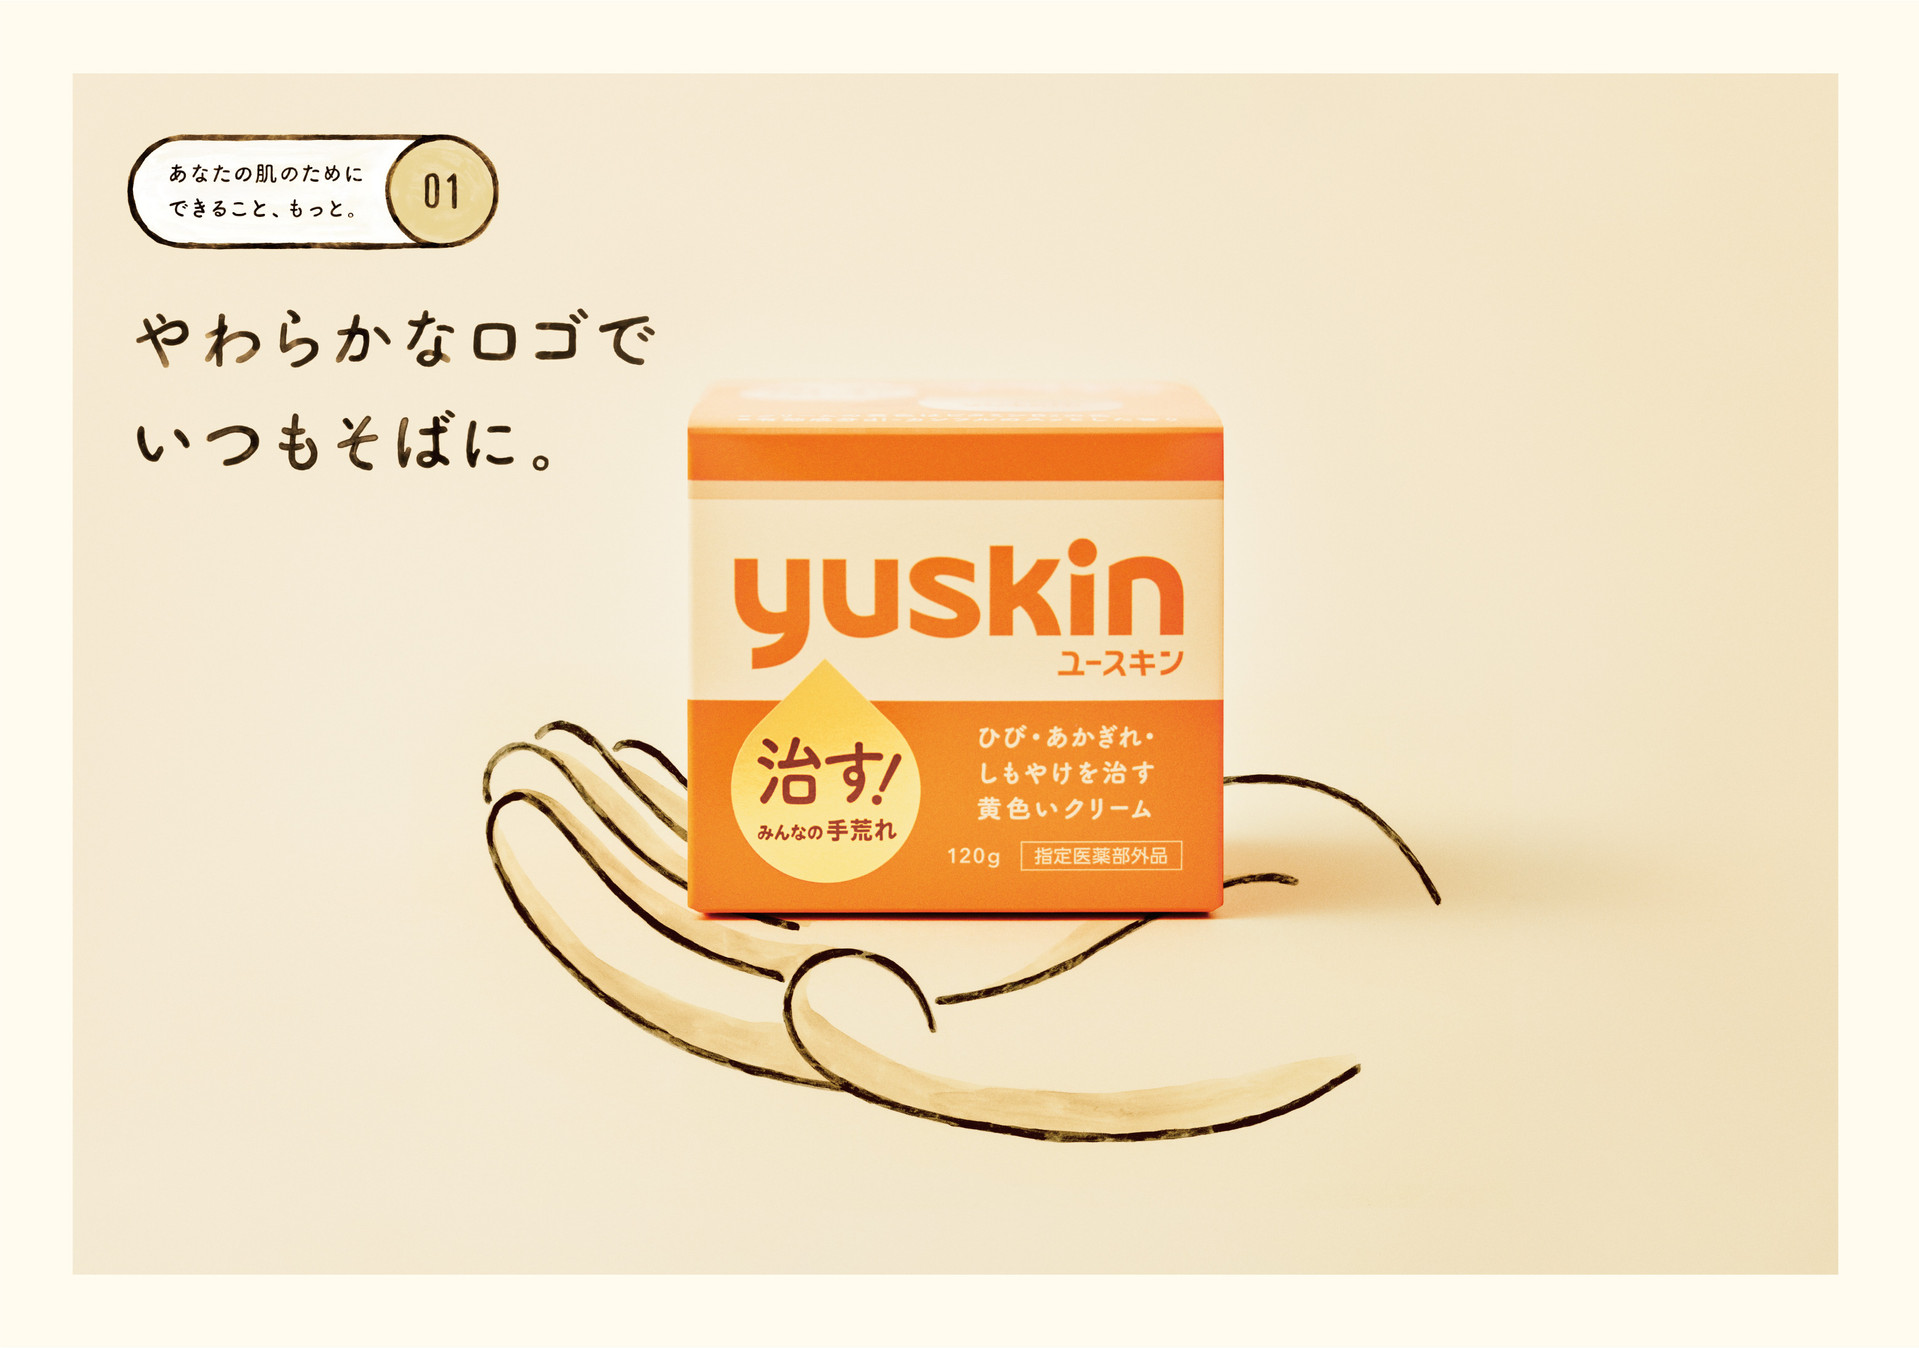 yuskin_2.jpg